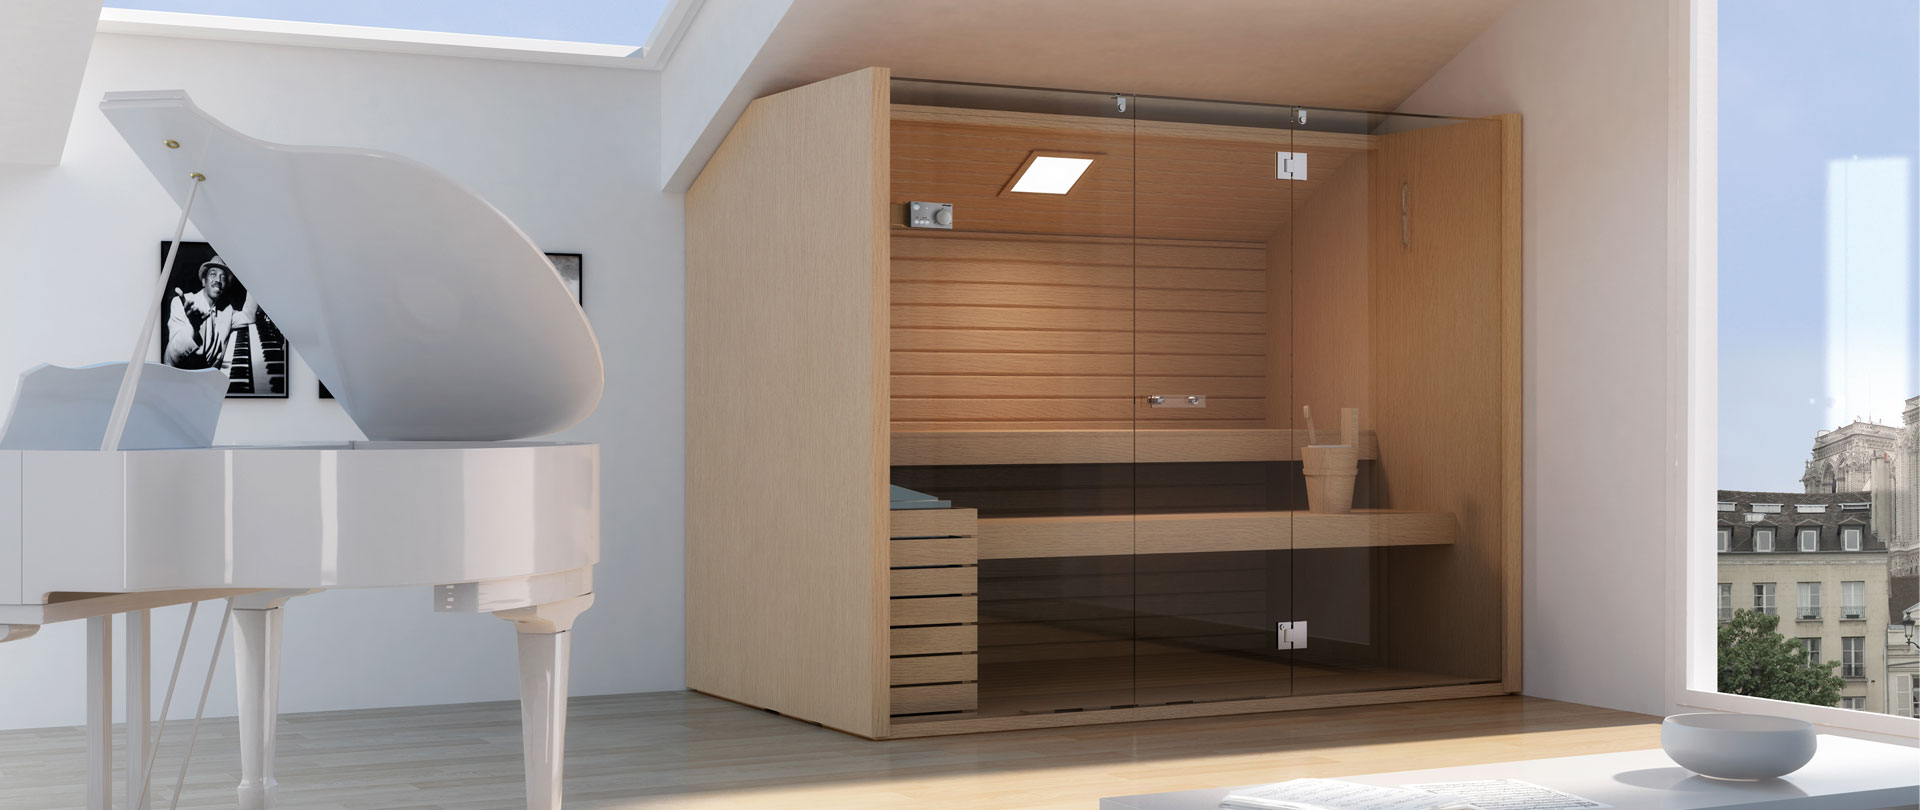 sauna int rieur en bois massif annecy atelier nordic. Black Bedroom Furniture Sets. Home Design Ideas